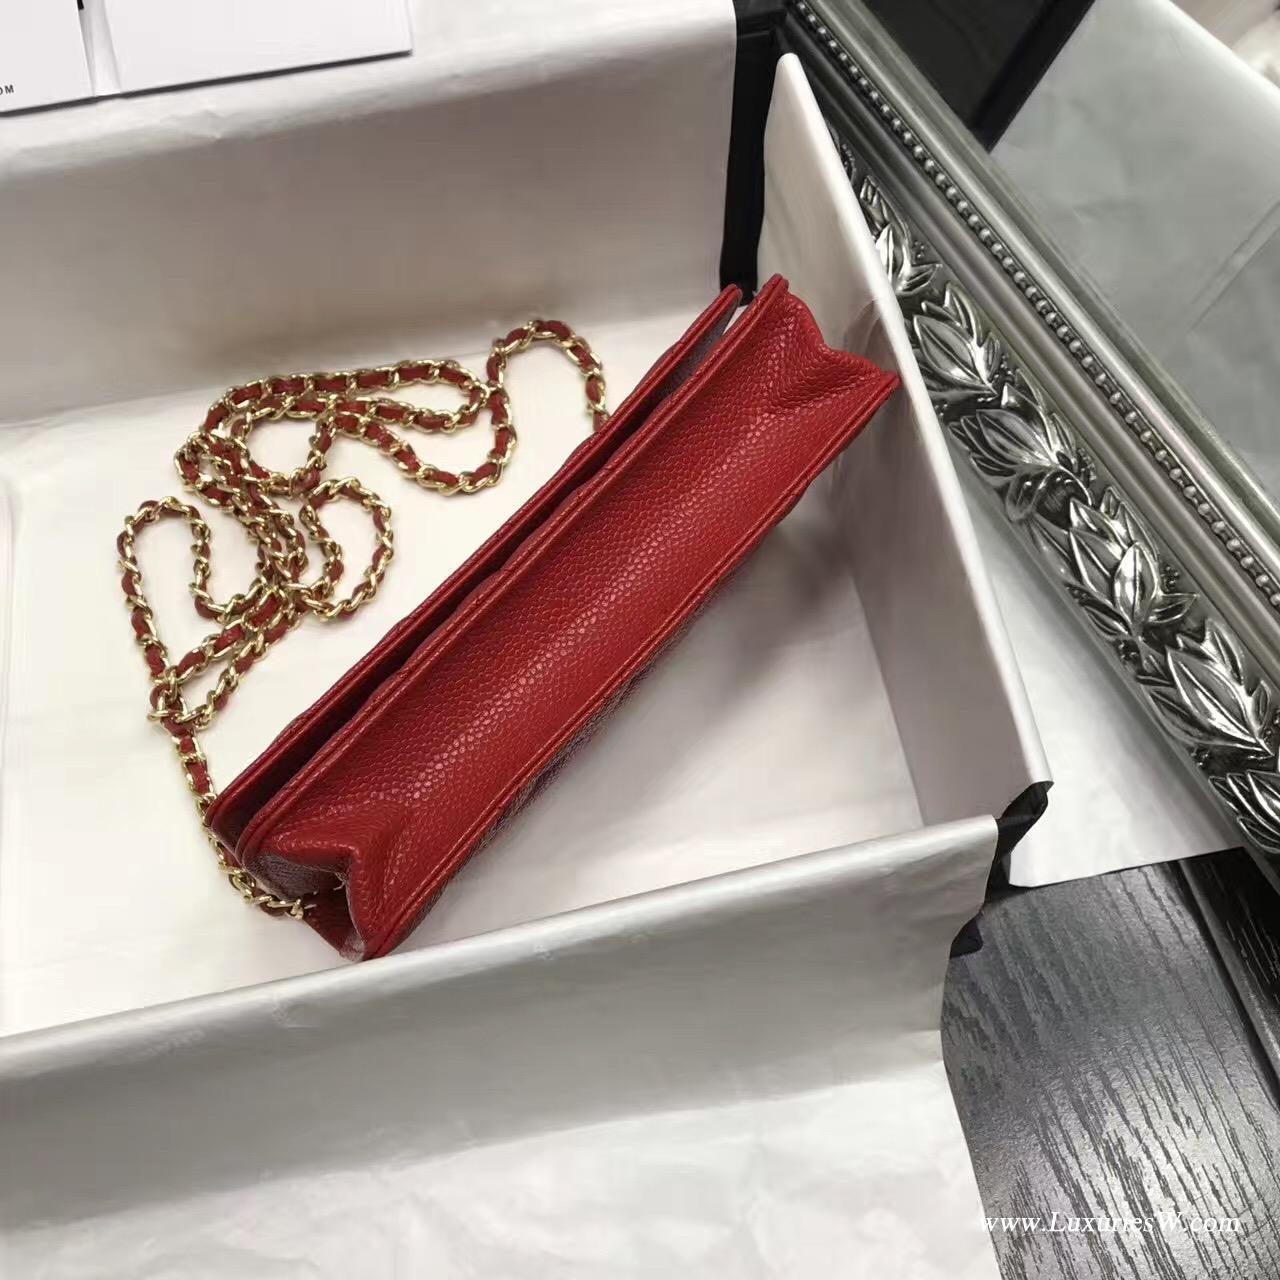 小香 Wallet On Chain魚子醬經典款紅色 金色五金